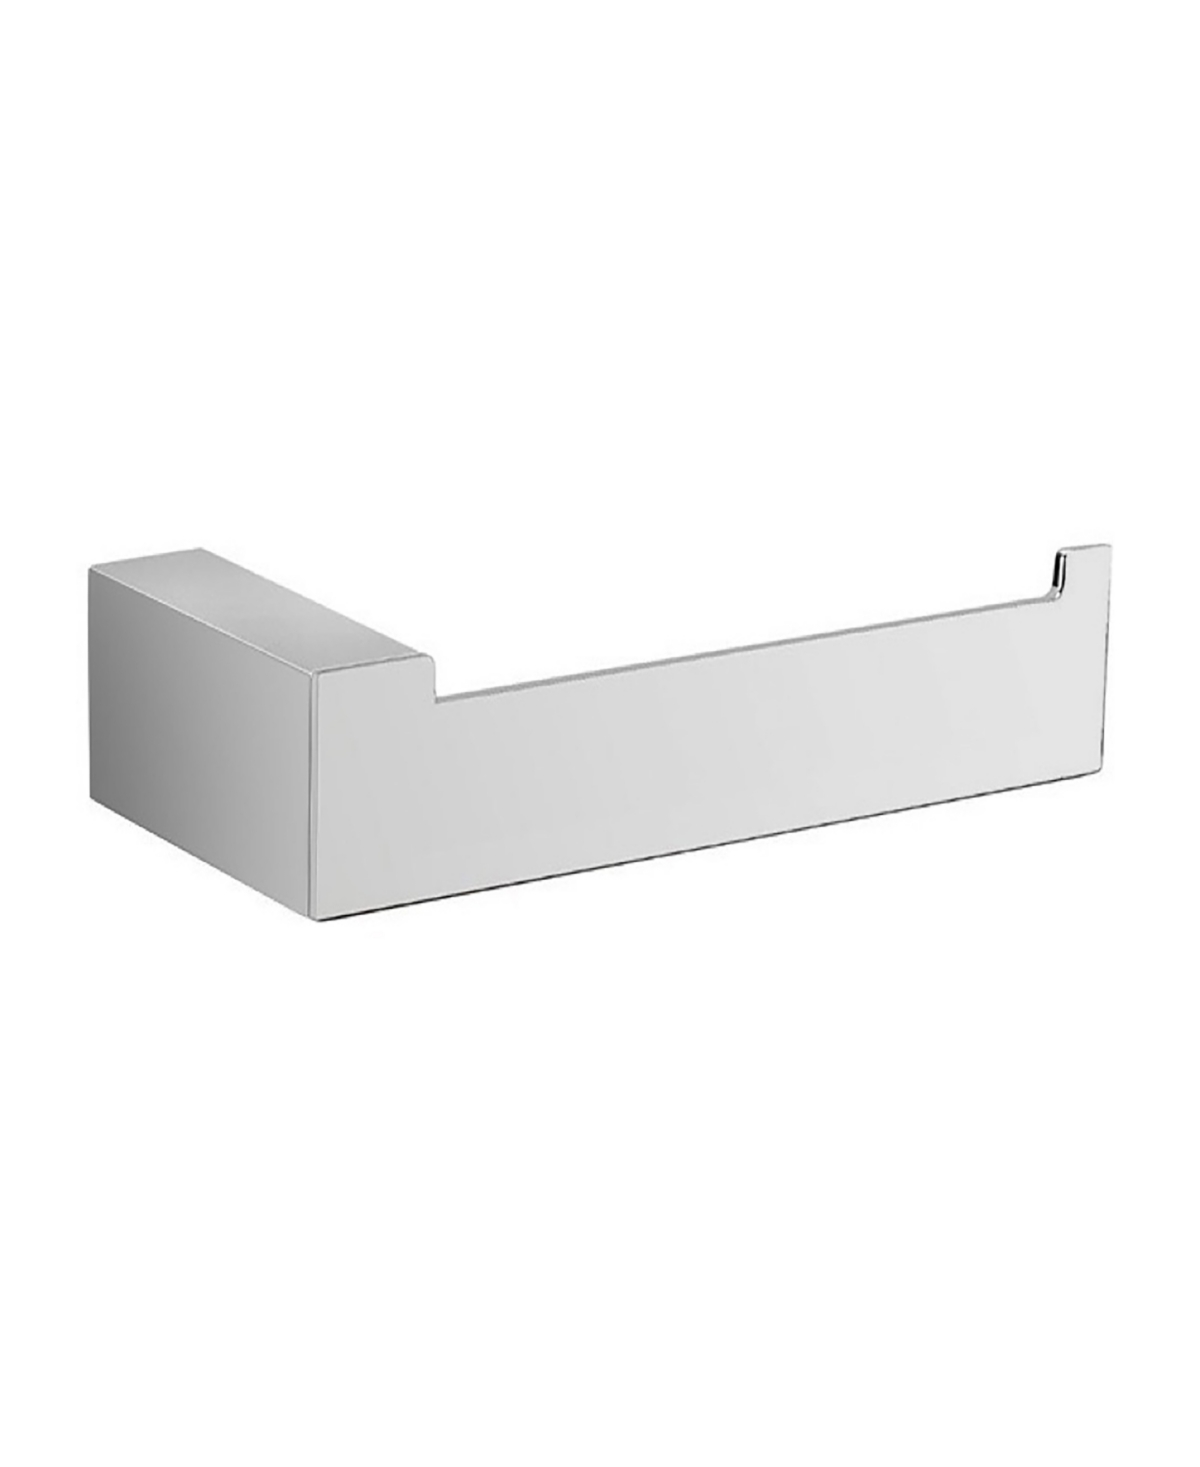 Nameeks General Hotel Rectangle Chrome Toilet Paper Holder Bedding